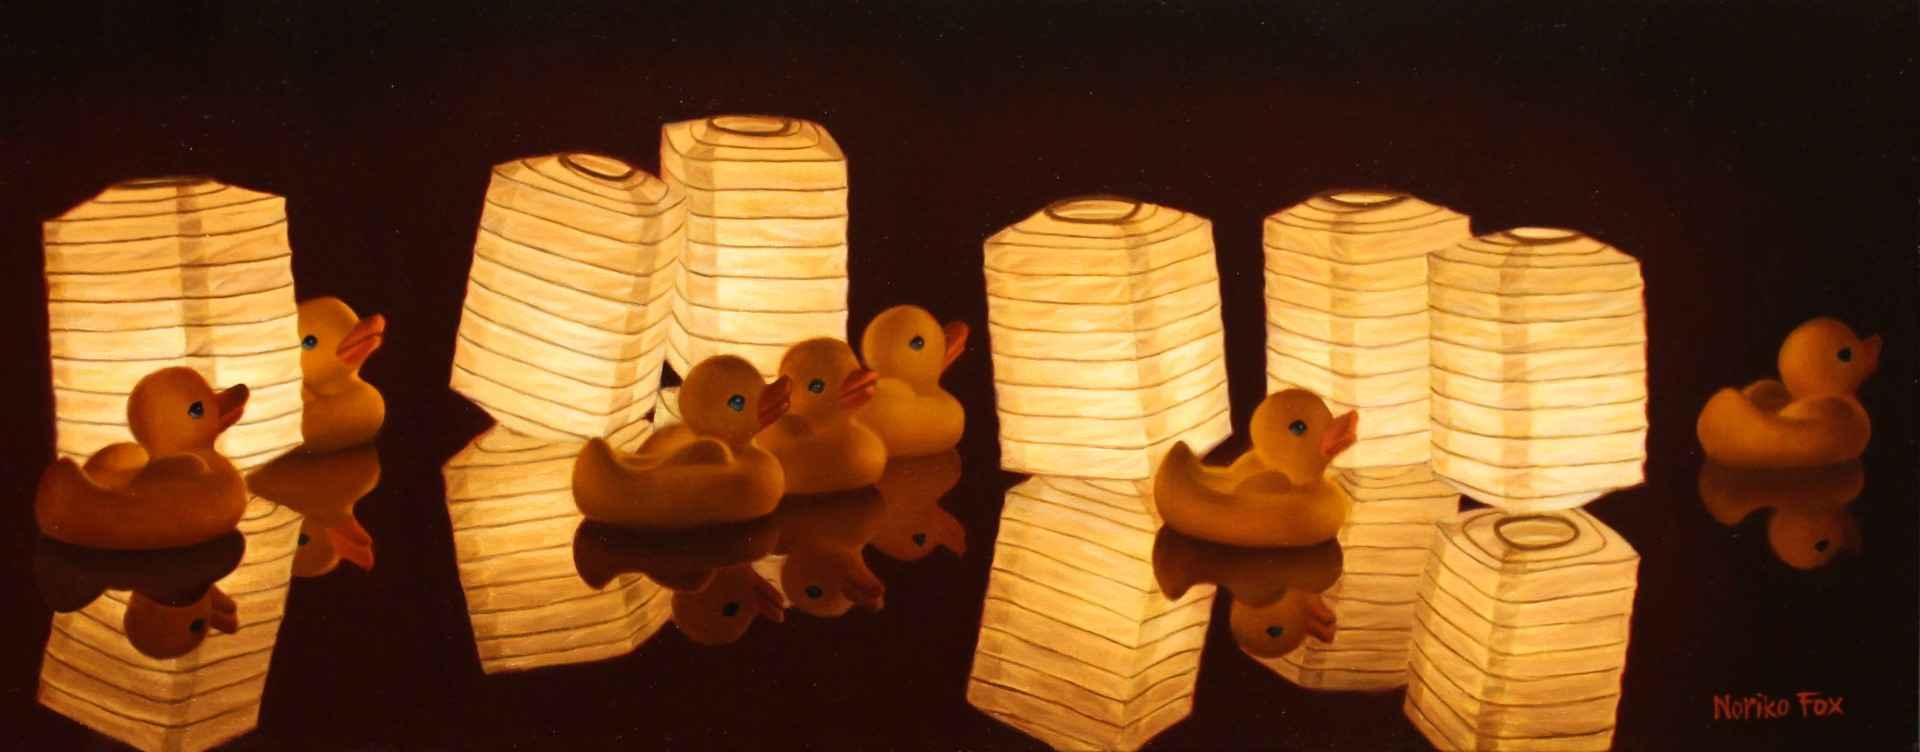 Luminaries by  Noriko Fox - Masterpiece Online